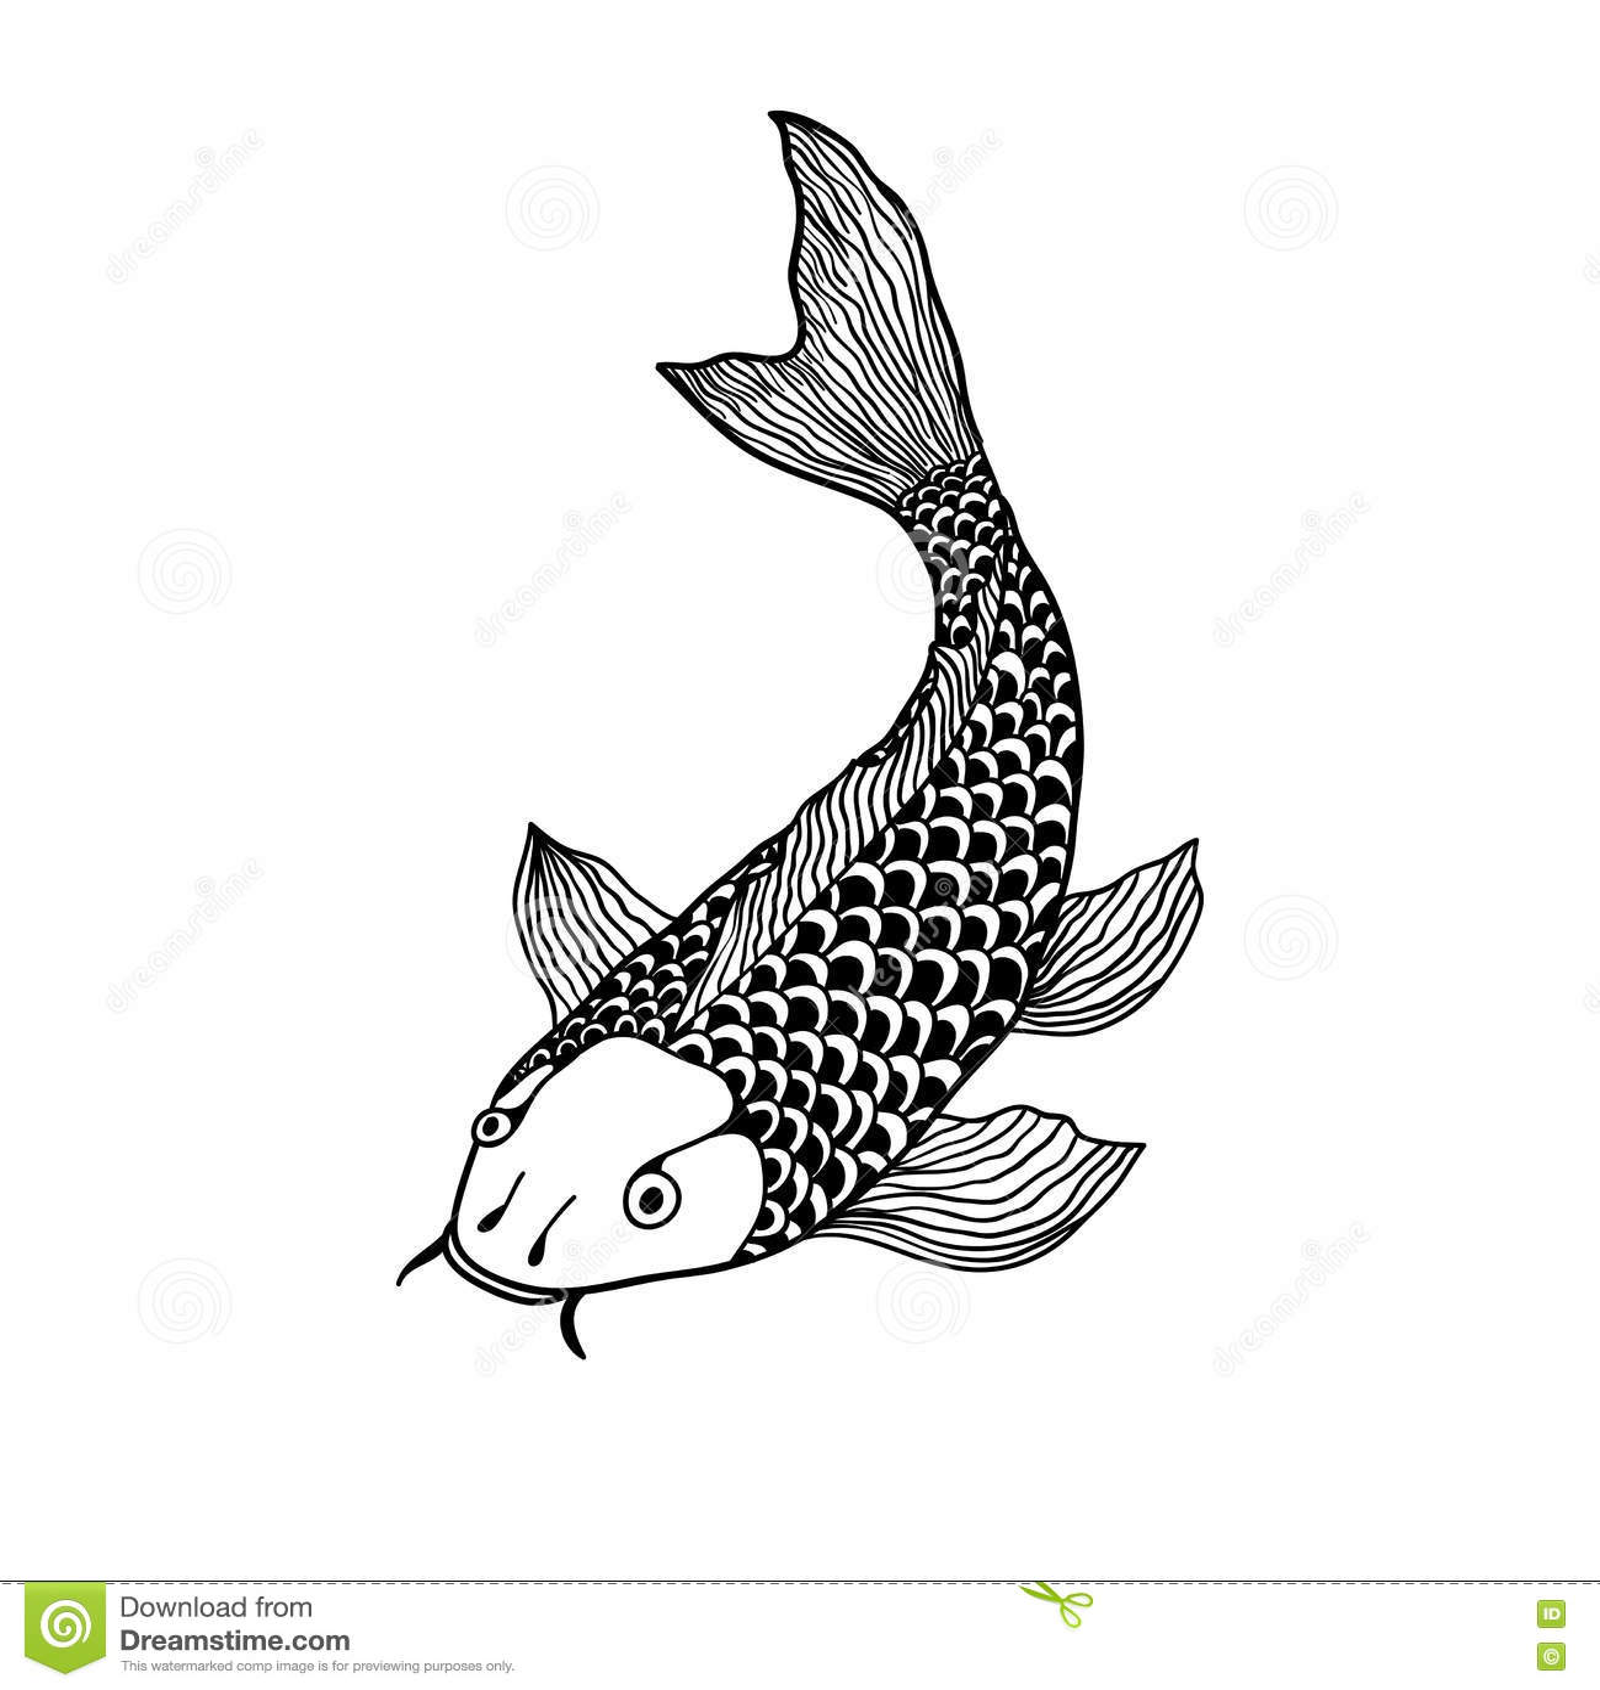 Carp fish illustration cartoon vector for Koi fish representation